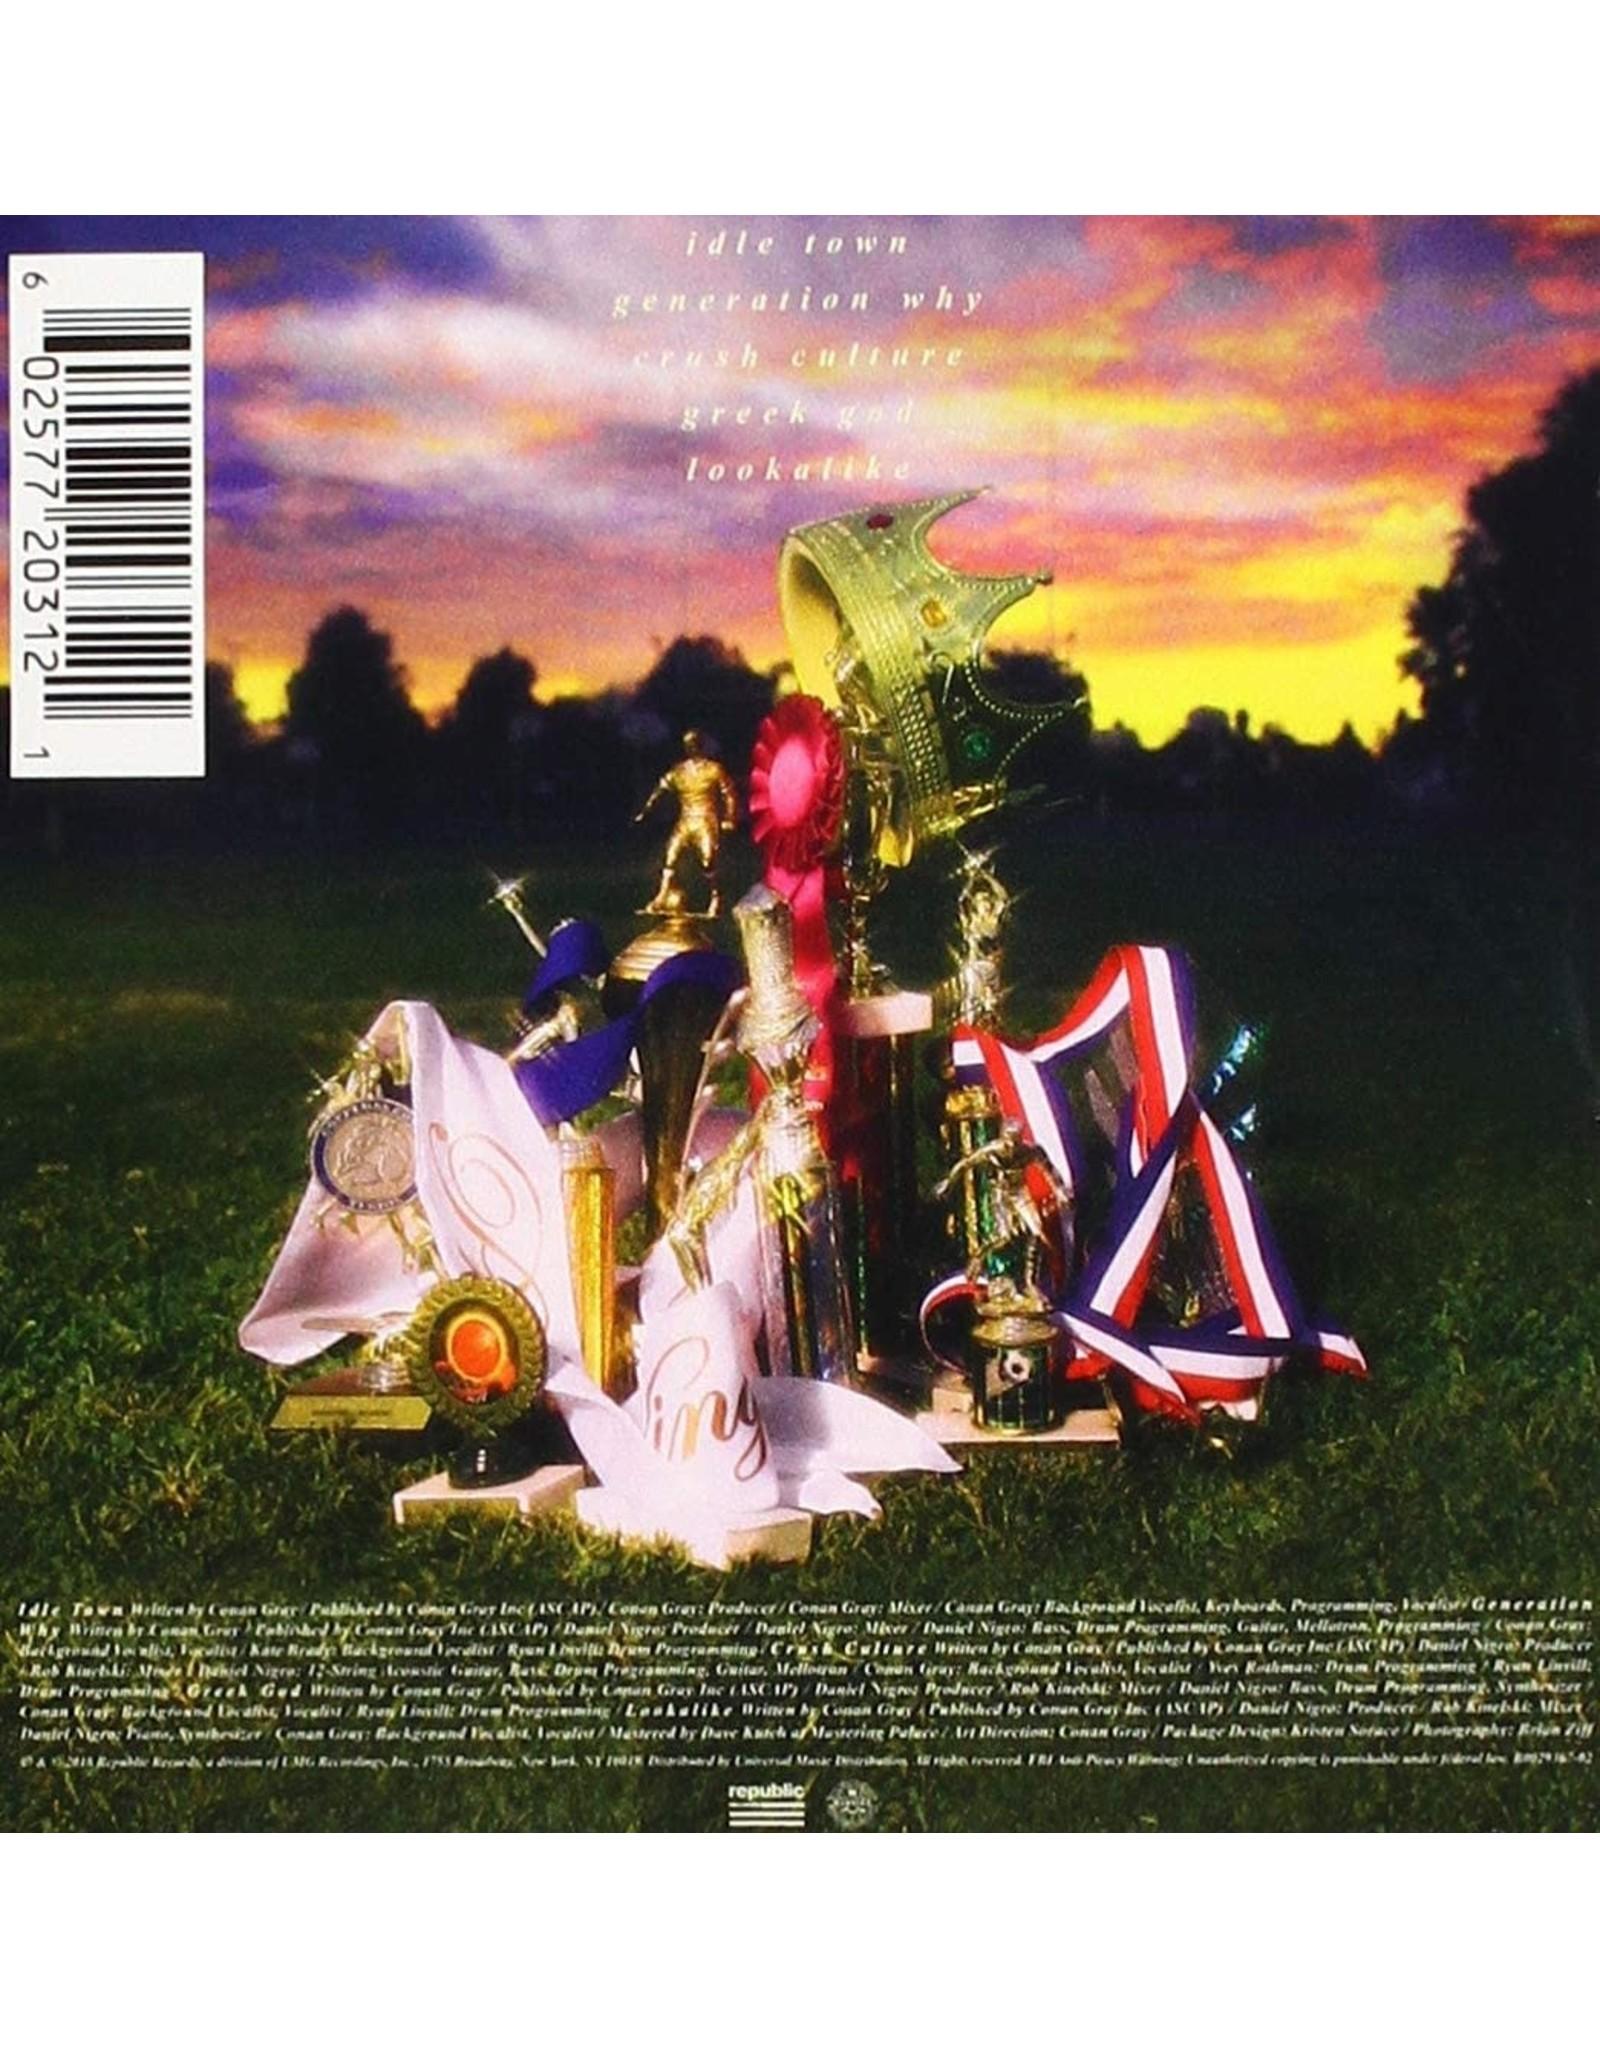 Conan Gray - Sunset Season EP (Teal Marble Vinyl)